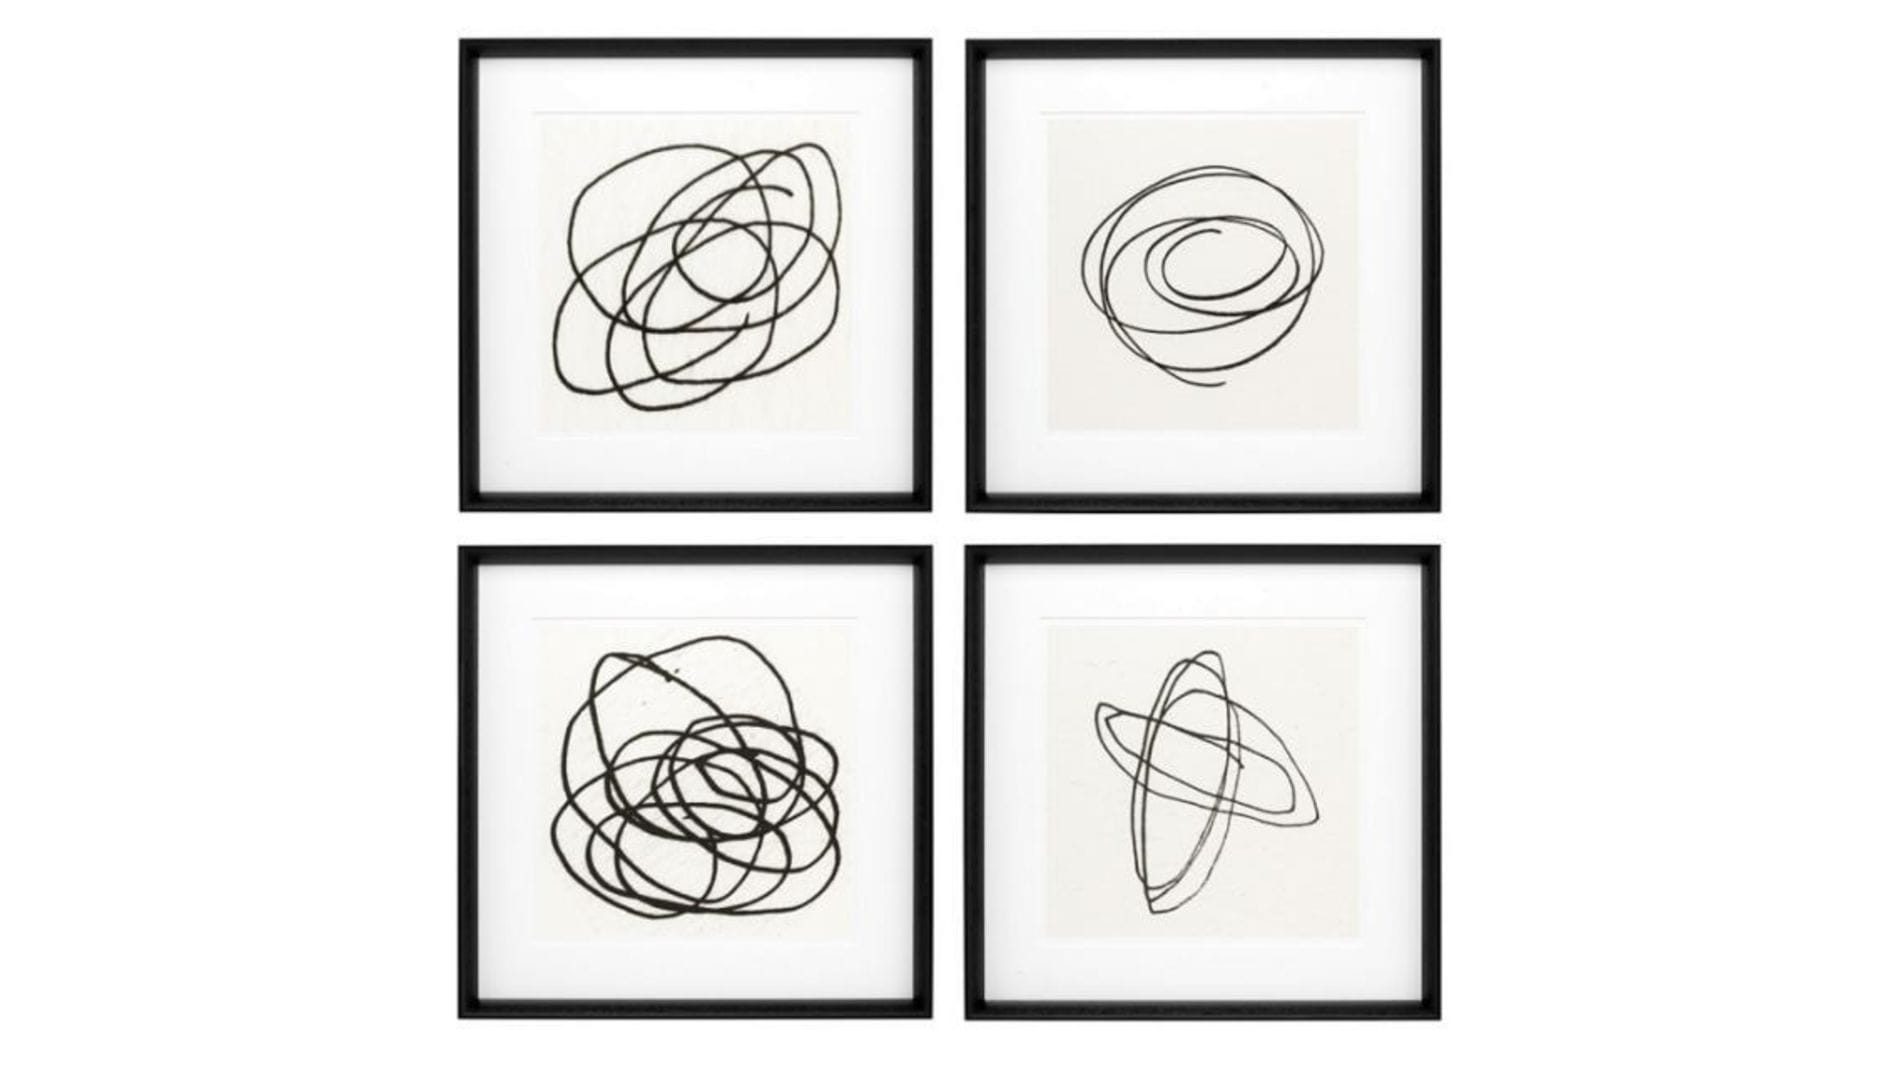 Постеры Black & White Collection набор 4 шт.